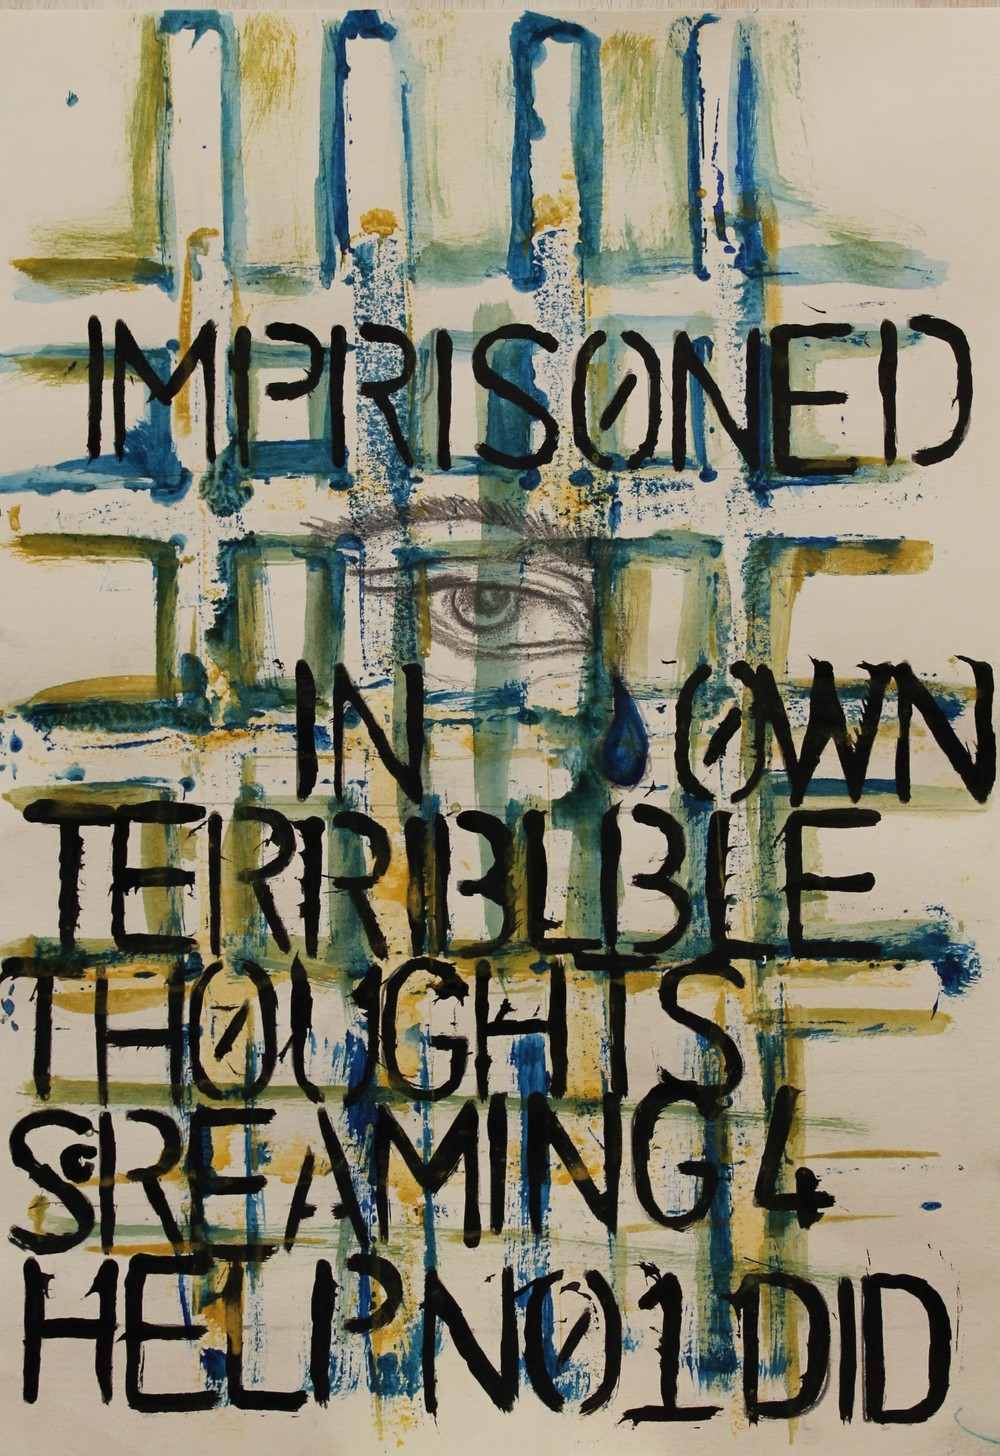 Artist: Tessa Belgrave